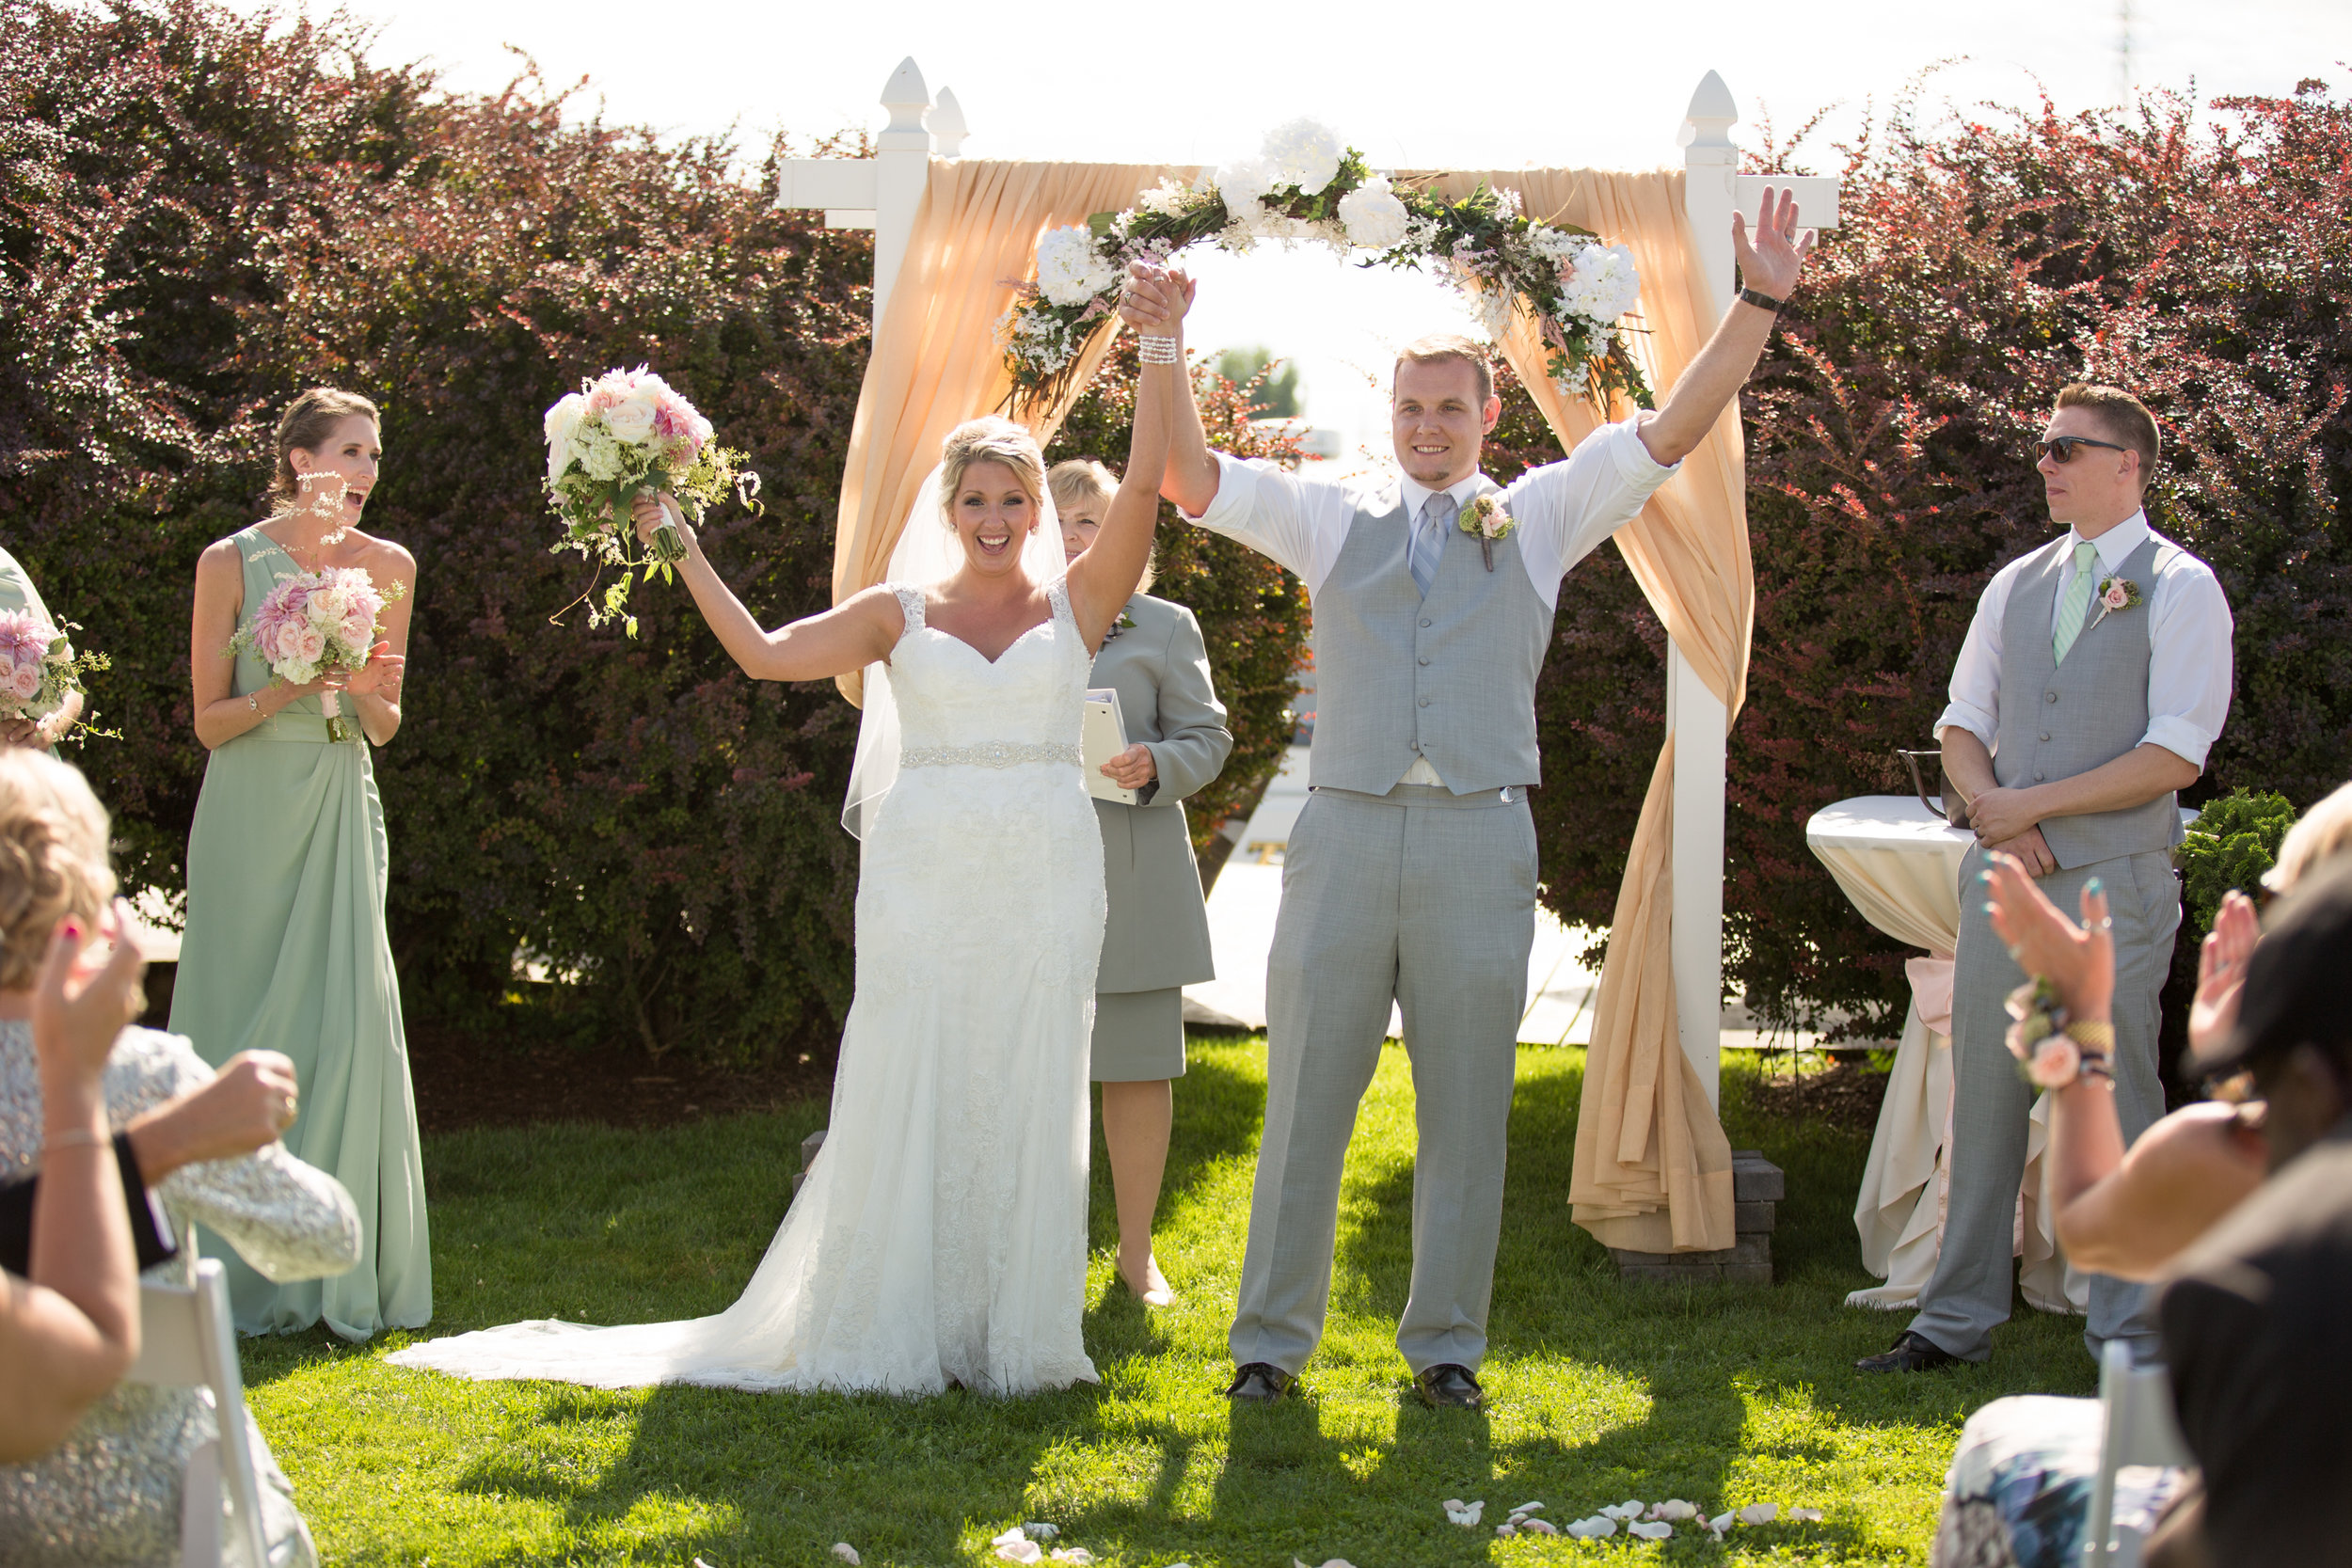 bride-and-groom-at-ceremony-celebrating-michigan-wedding-photographer